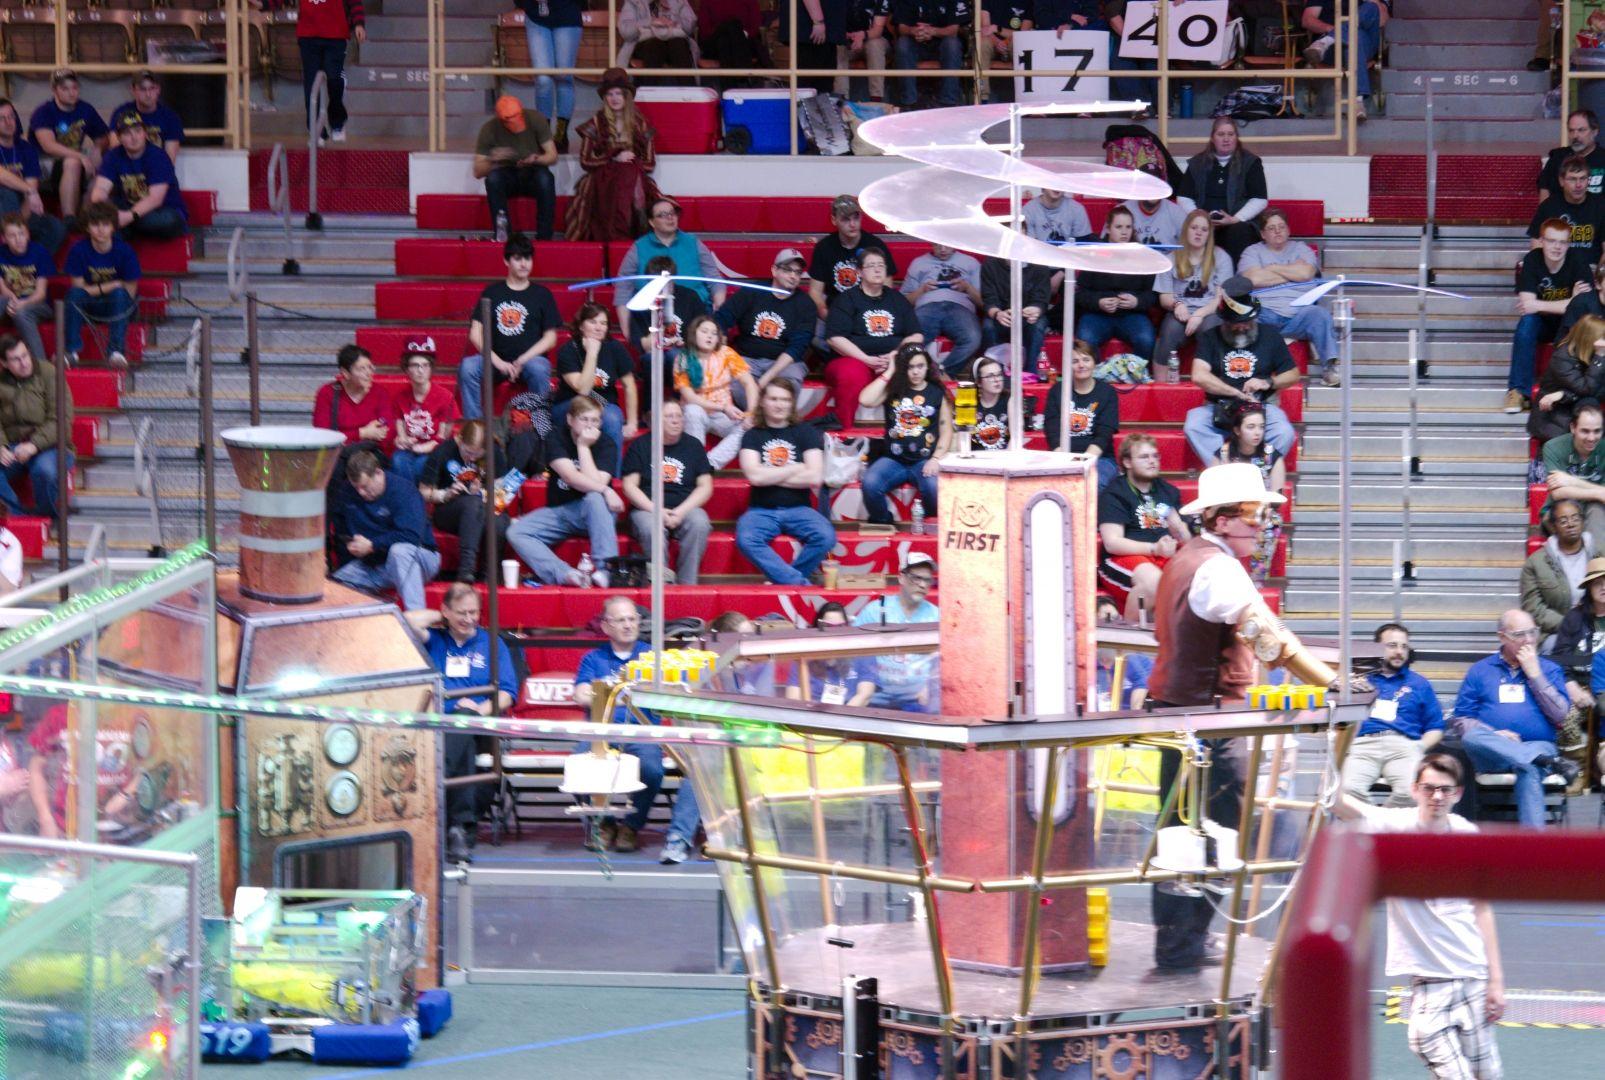 026.2017.WPI.First Robotics Competition